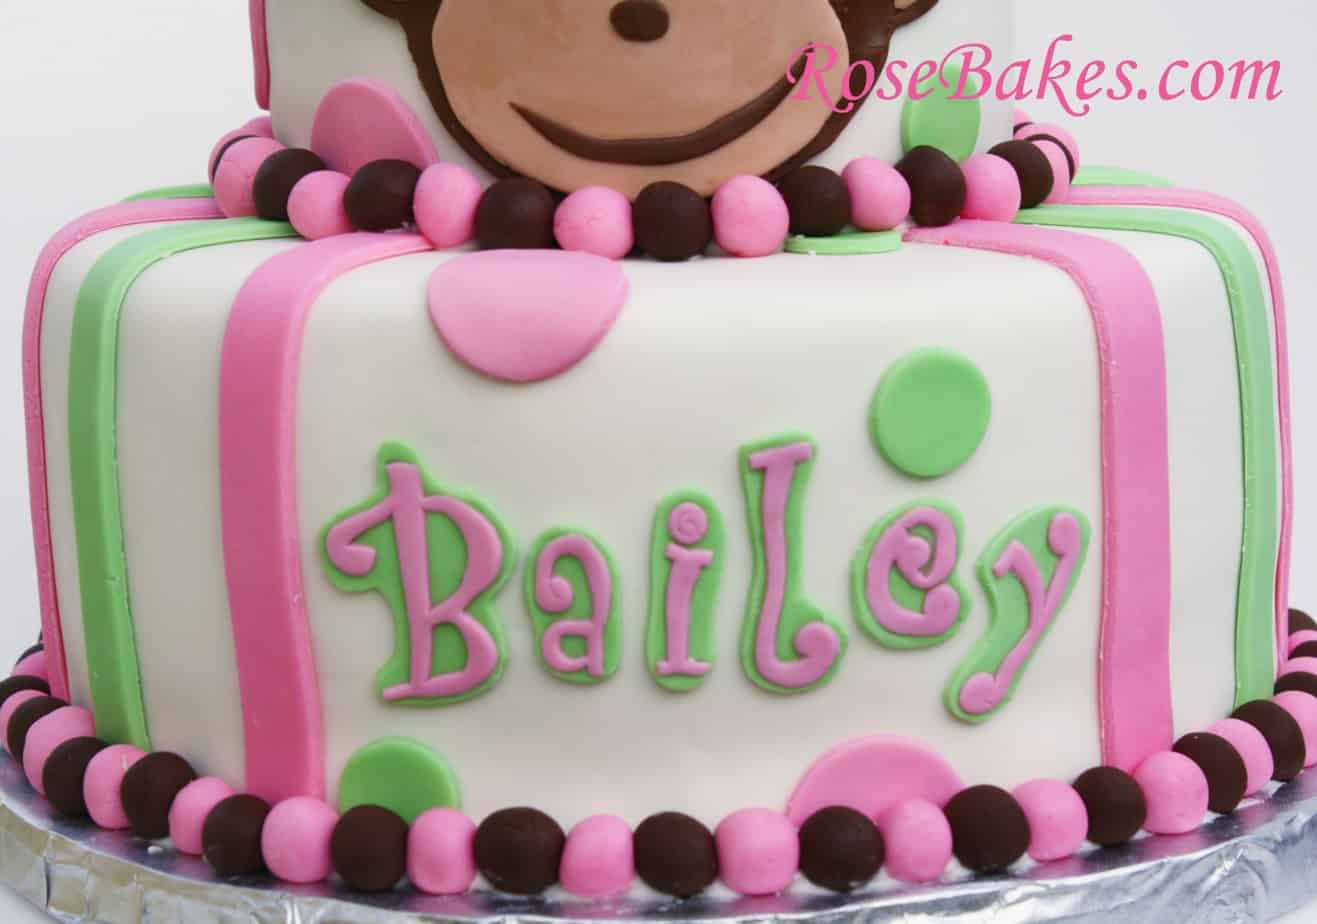 Pink Mod Monkey Cake Picture Bottom Rose Bakes